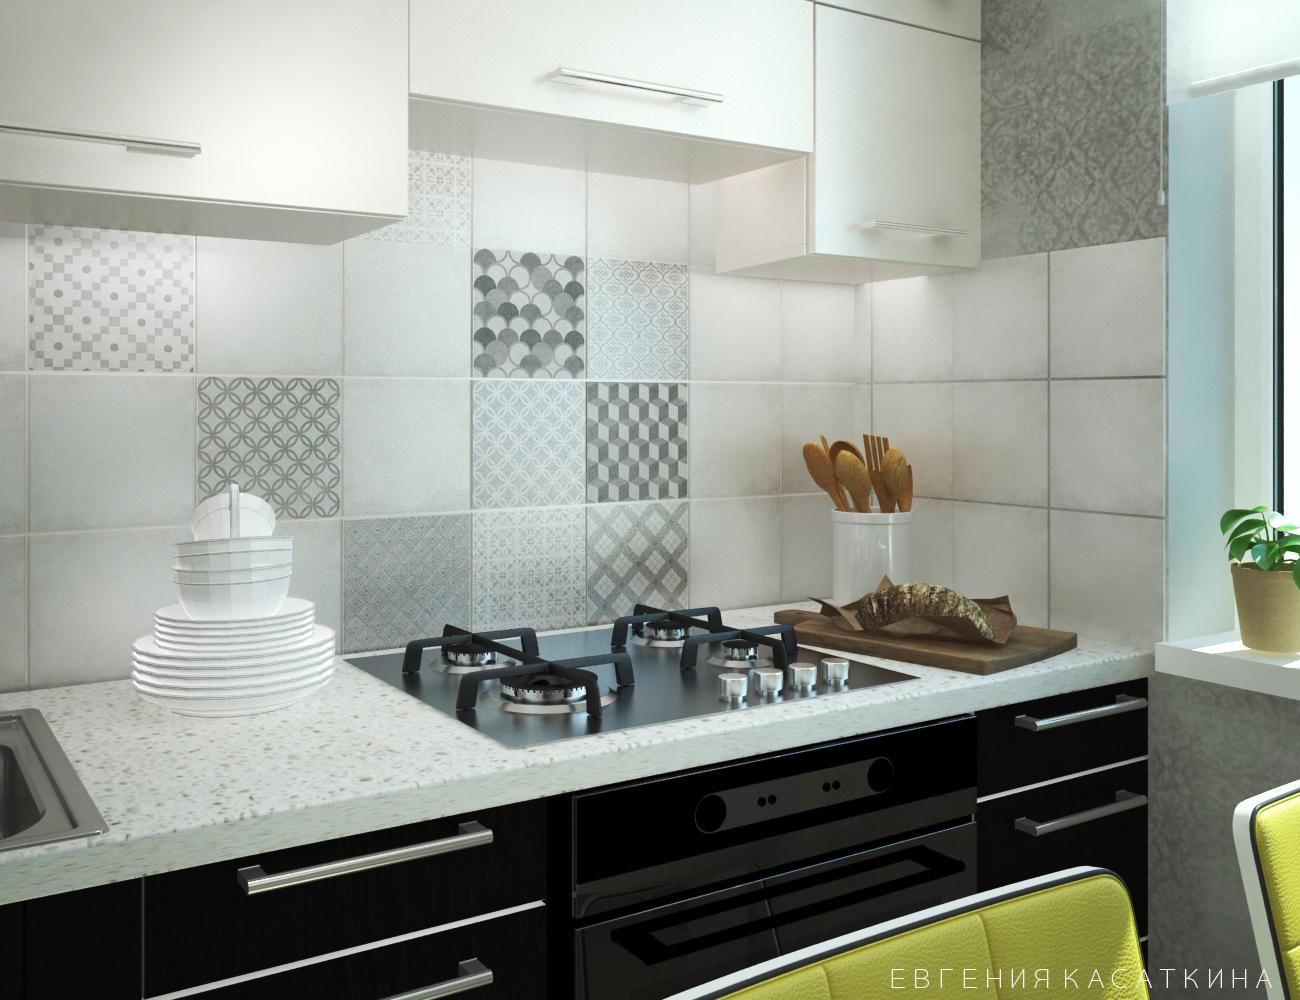 Карнаби-стрит керама марацци в интерьере фото.